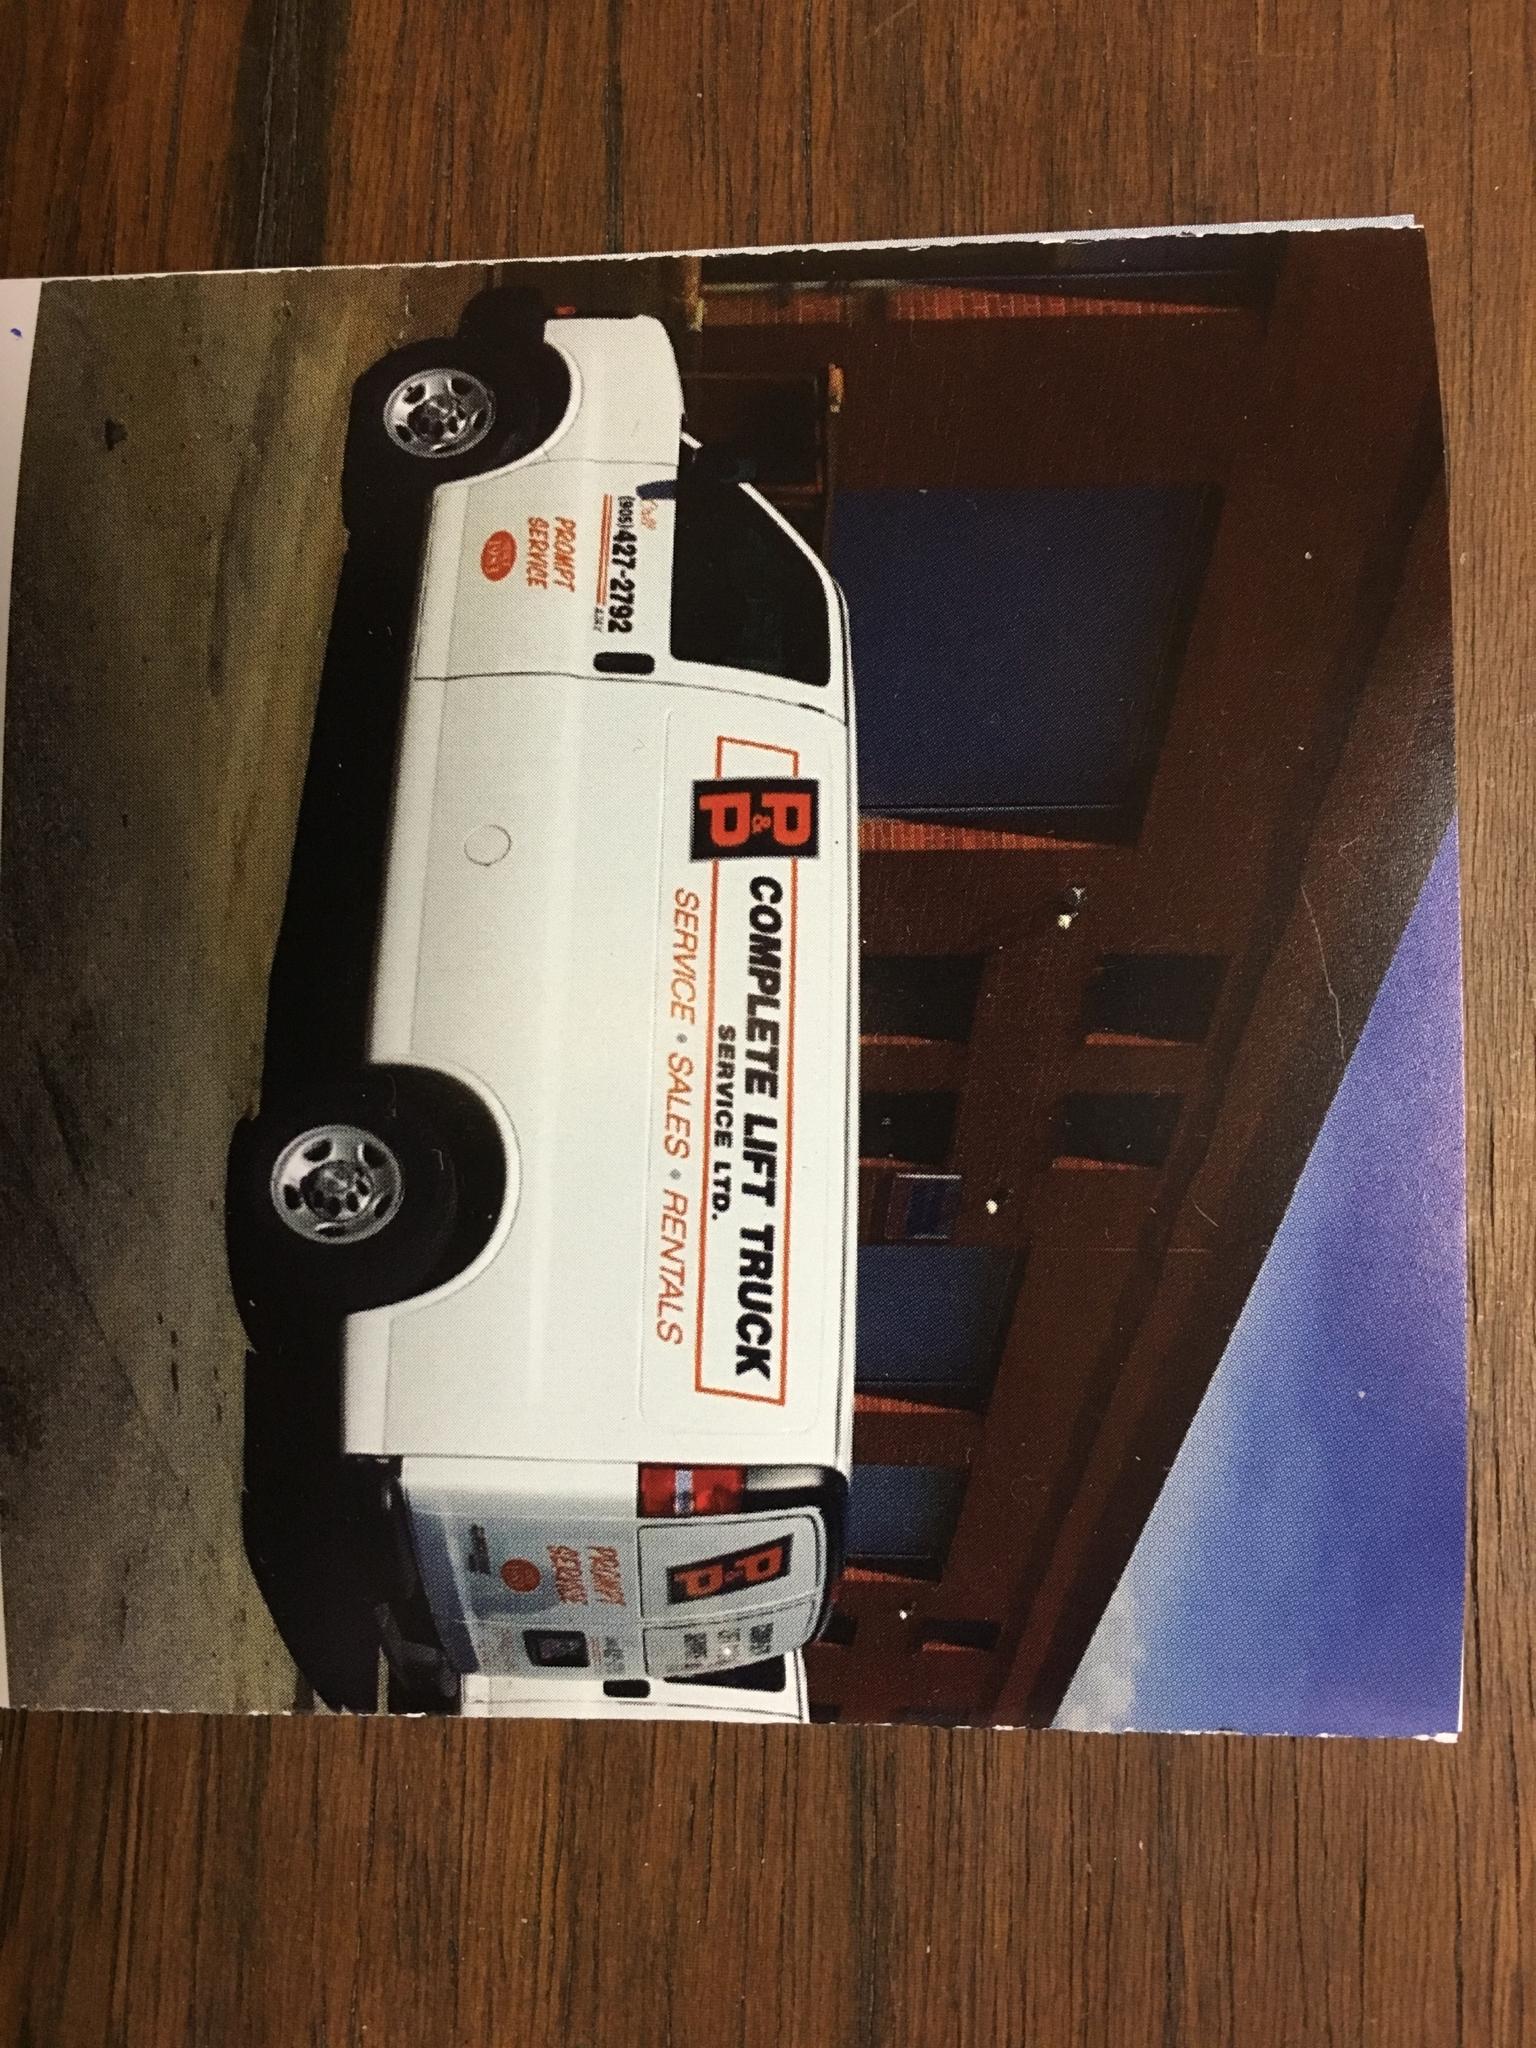 P & P Complete Lift Truck Service Ltd in Ajax